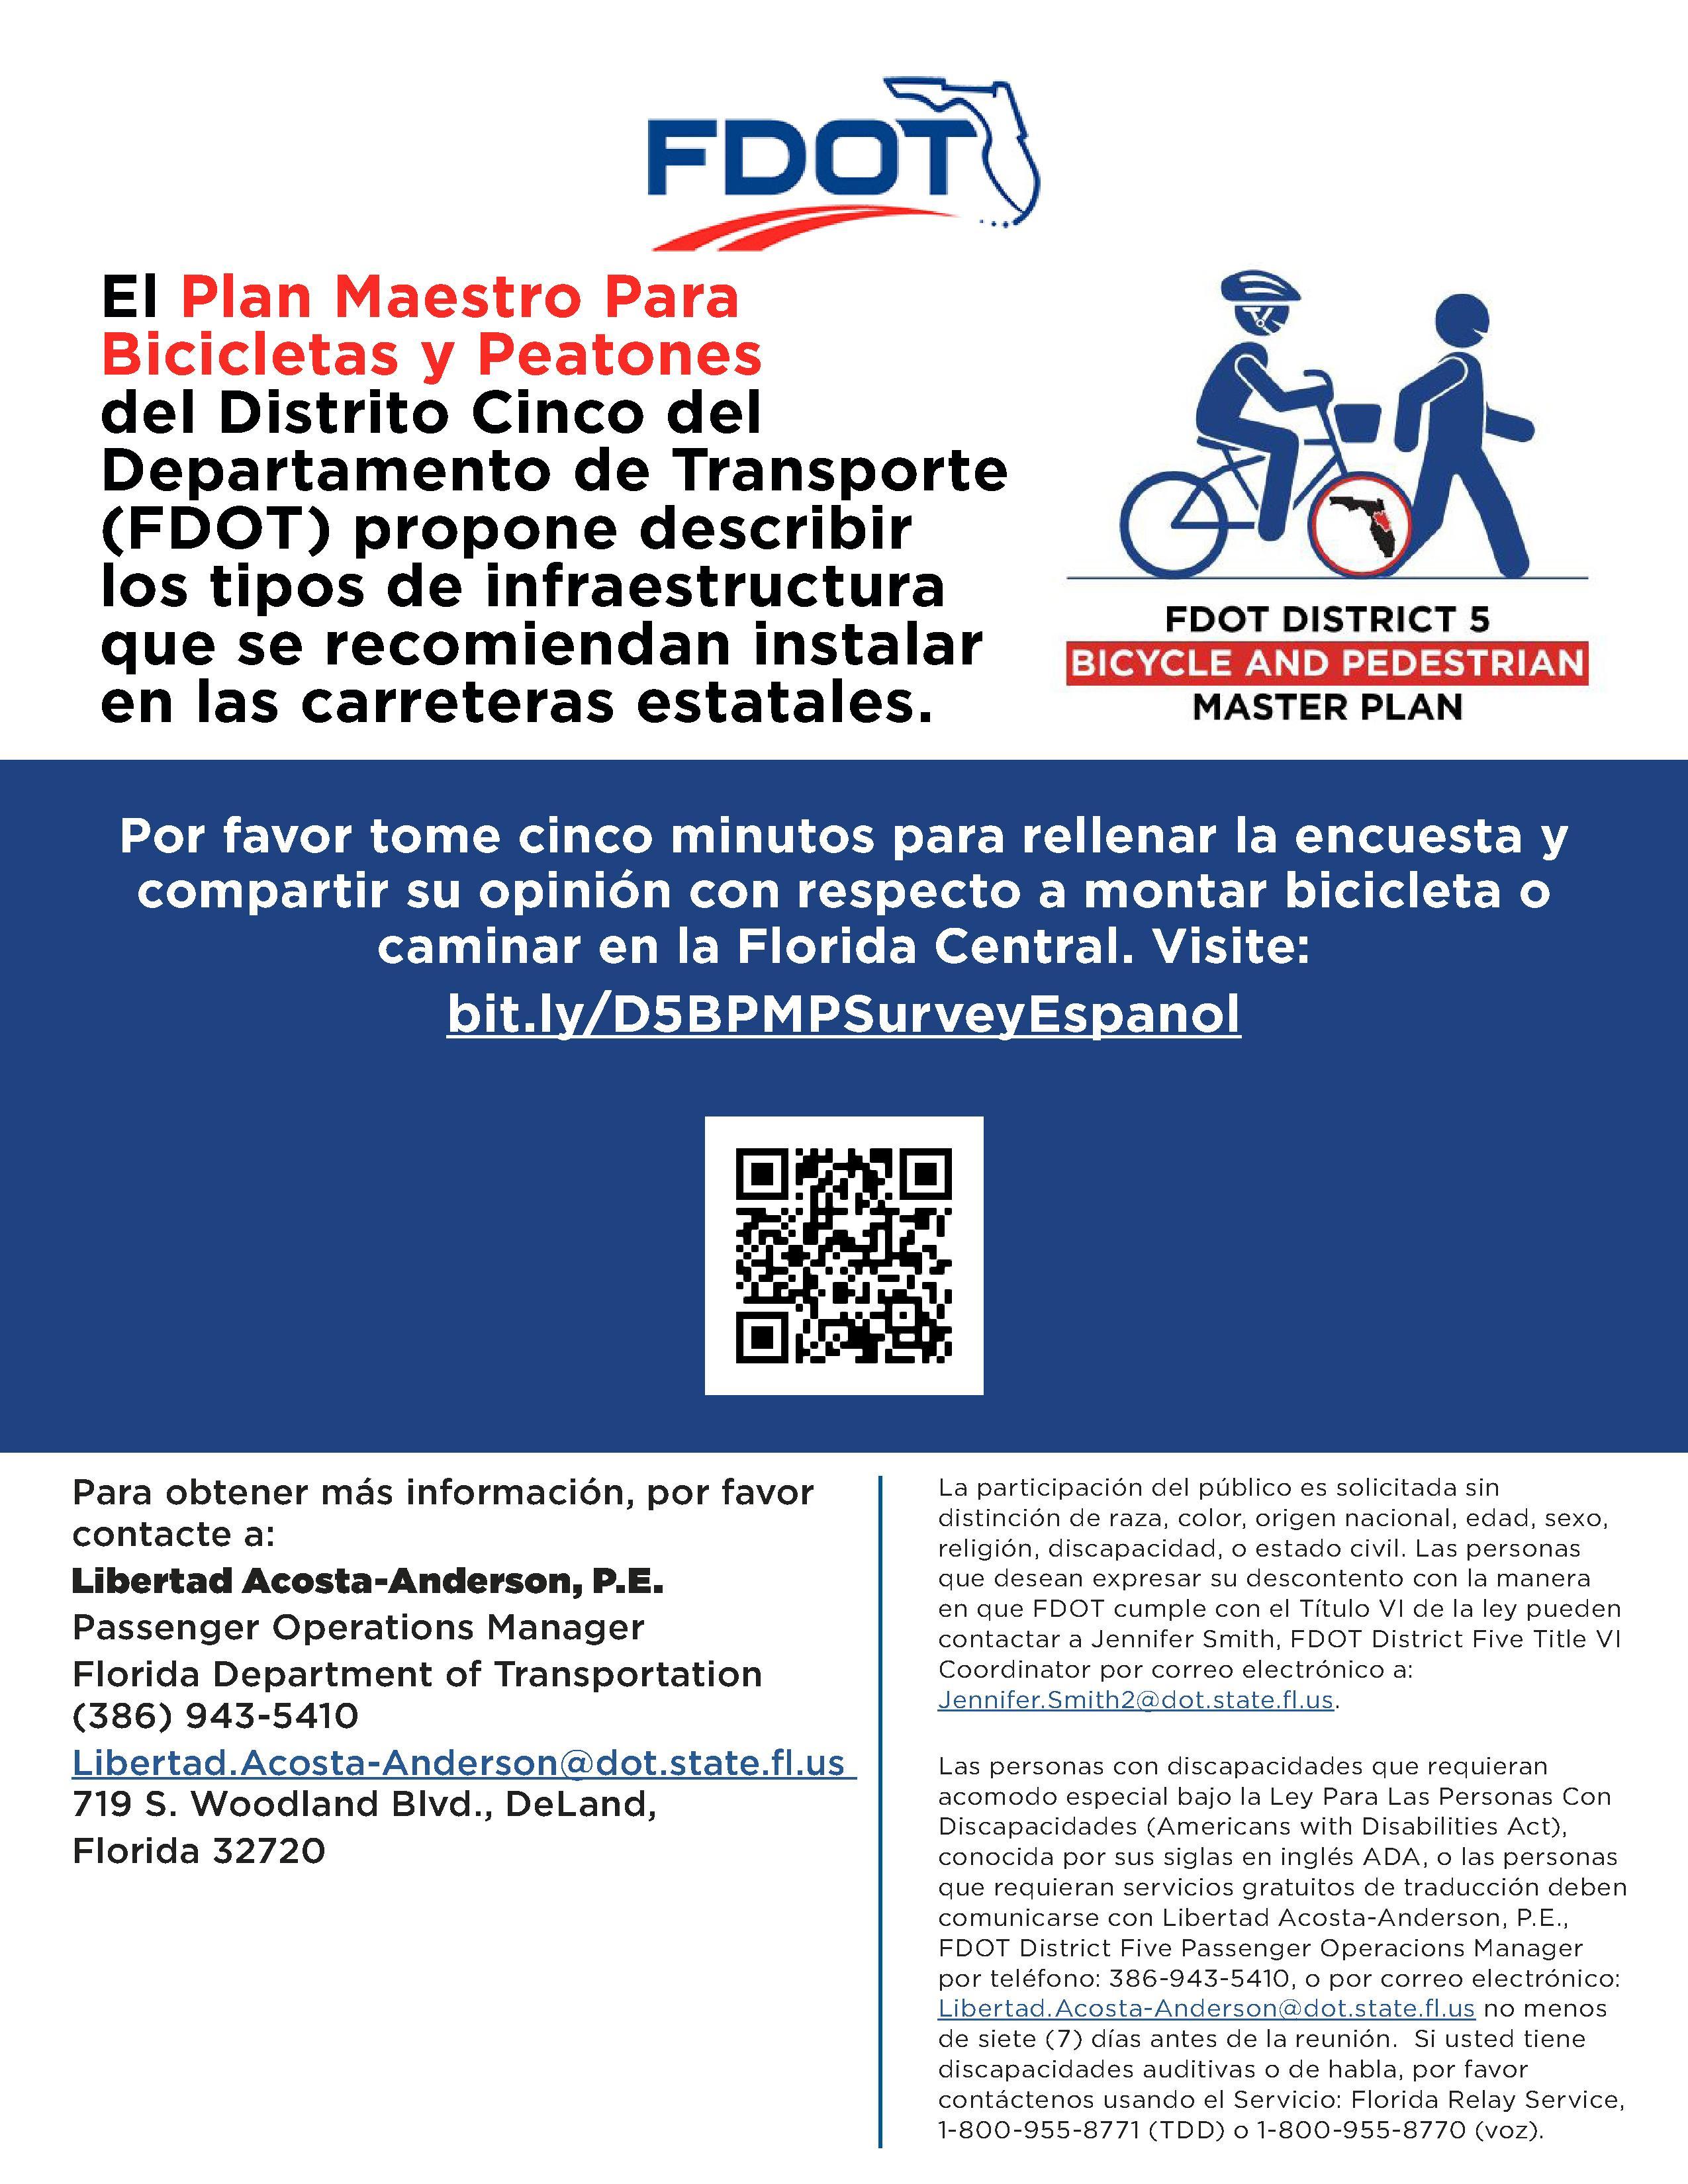 BPMP User Survey Espanol